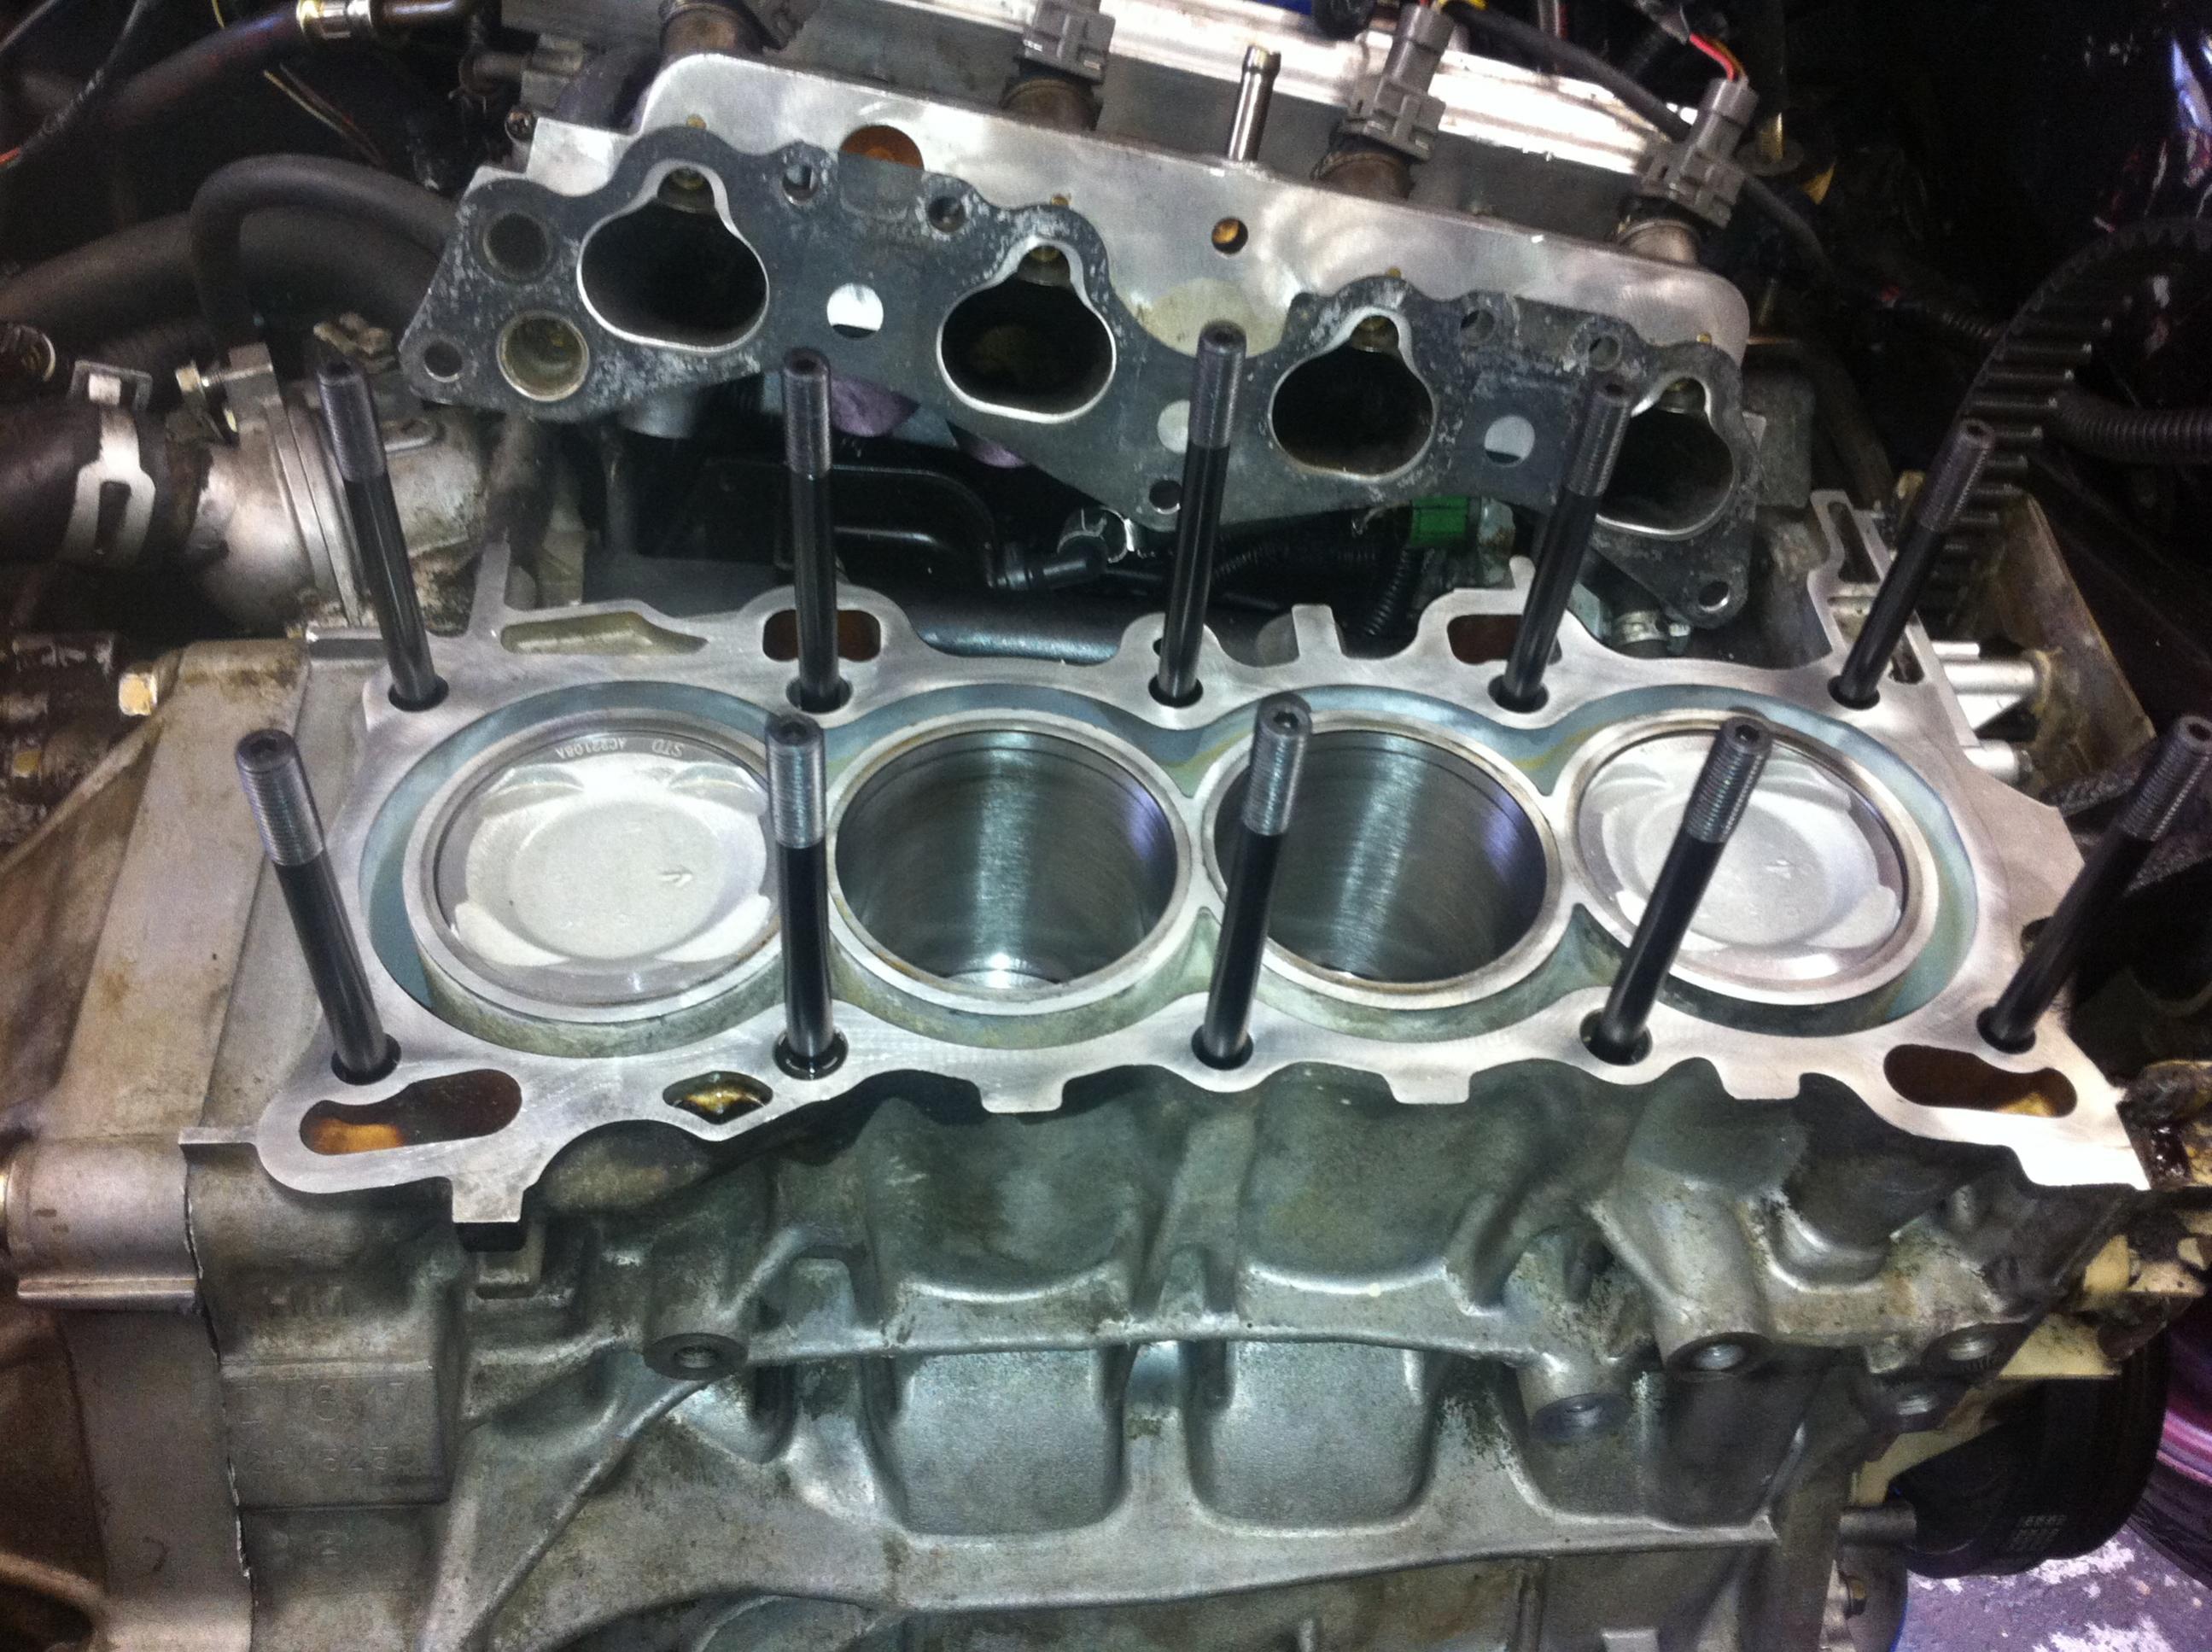 d16z6 turbo setup/build 250hp-198trq - D-series org